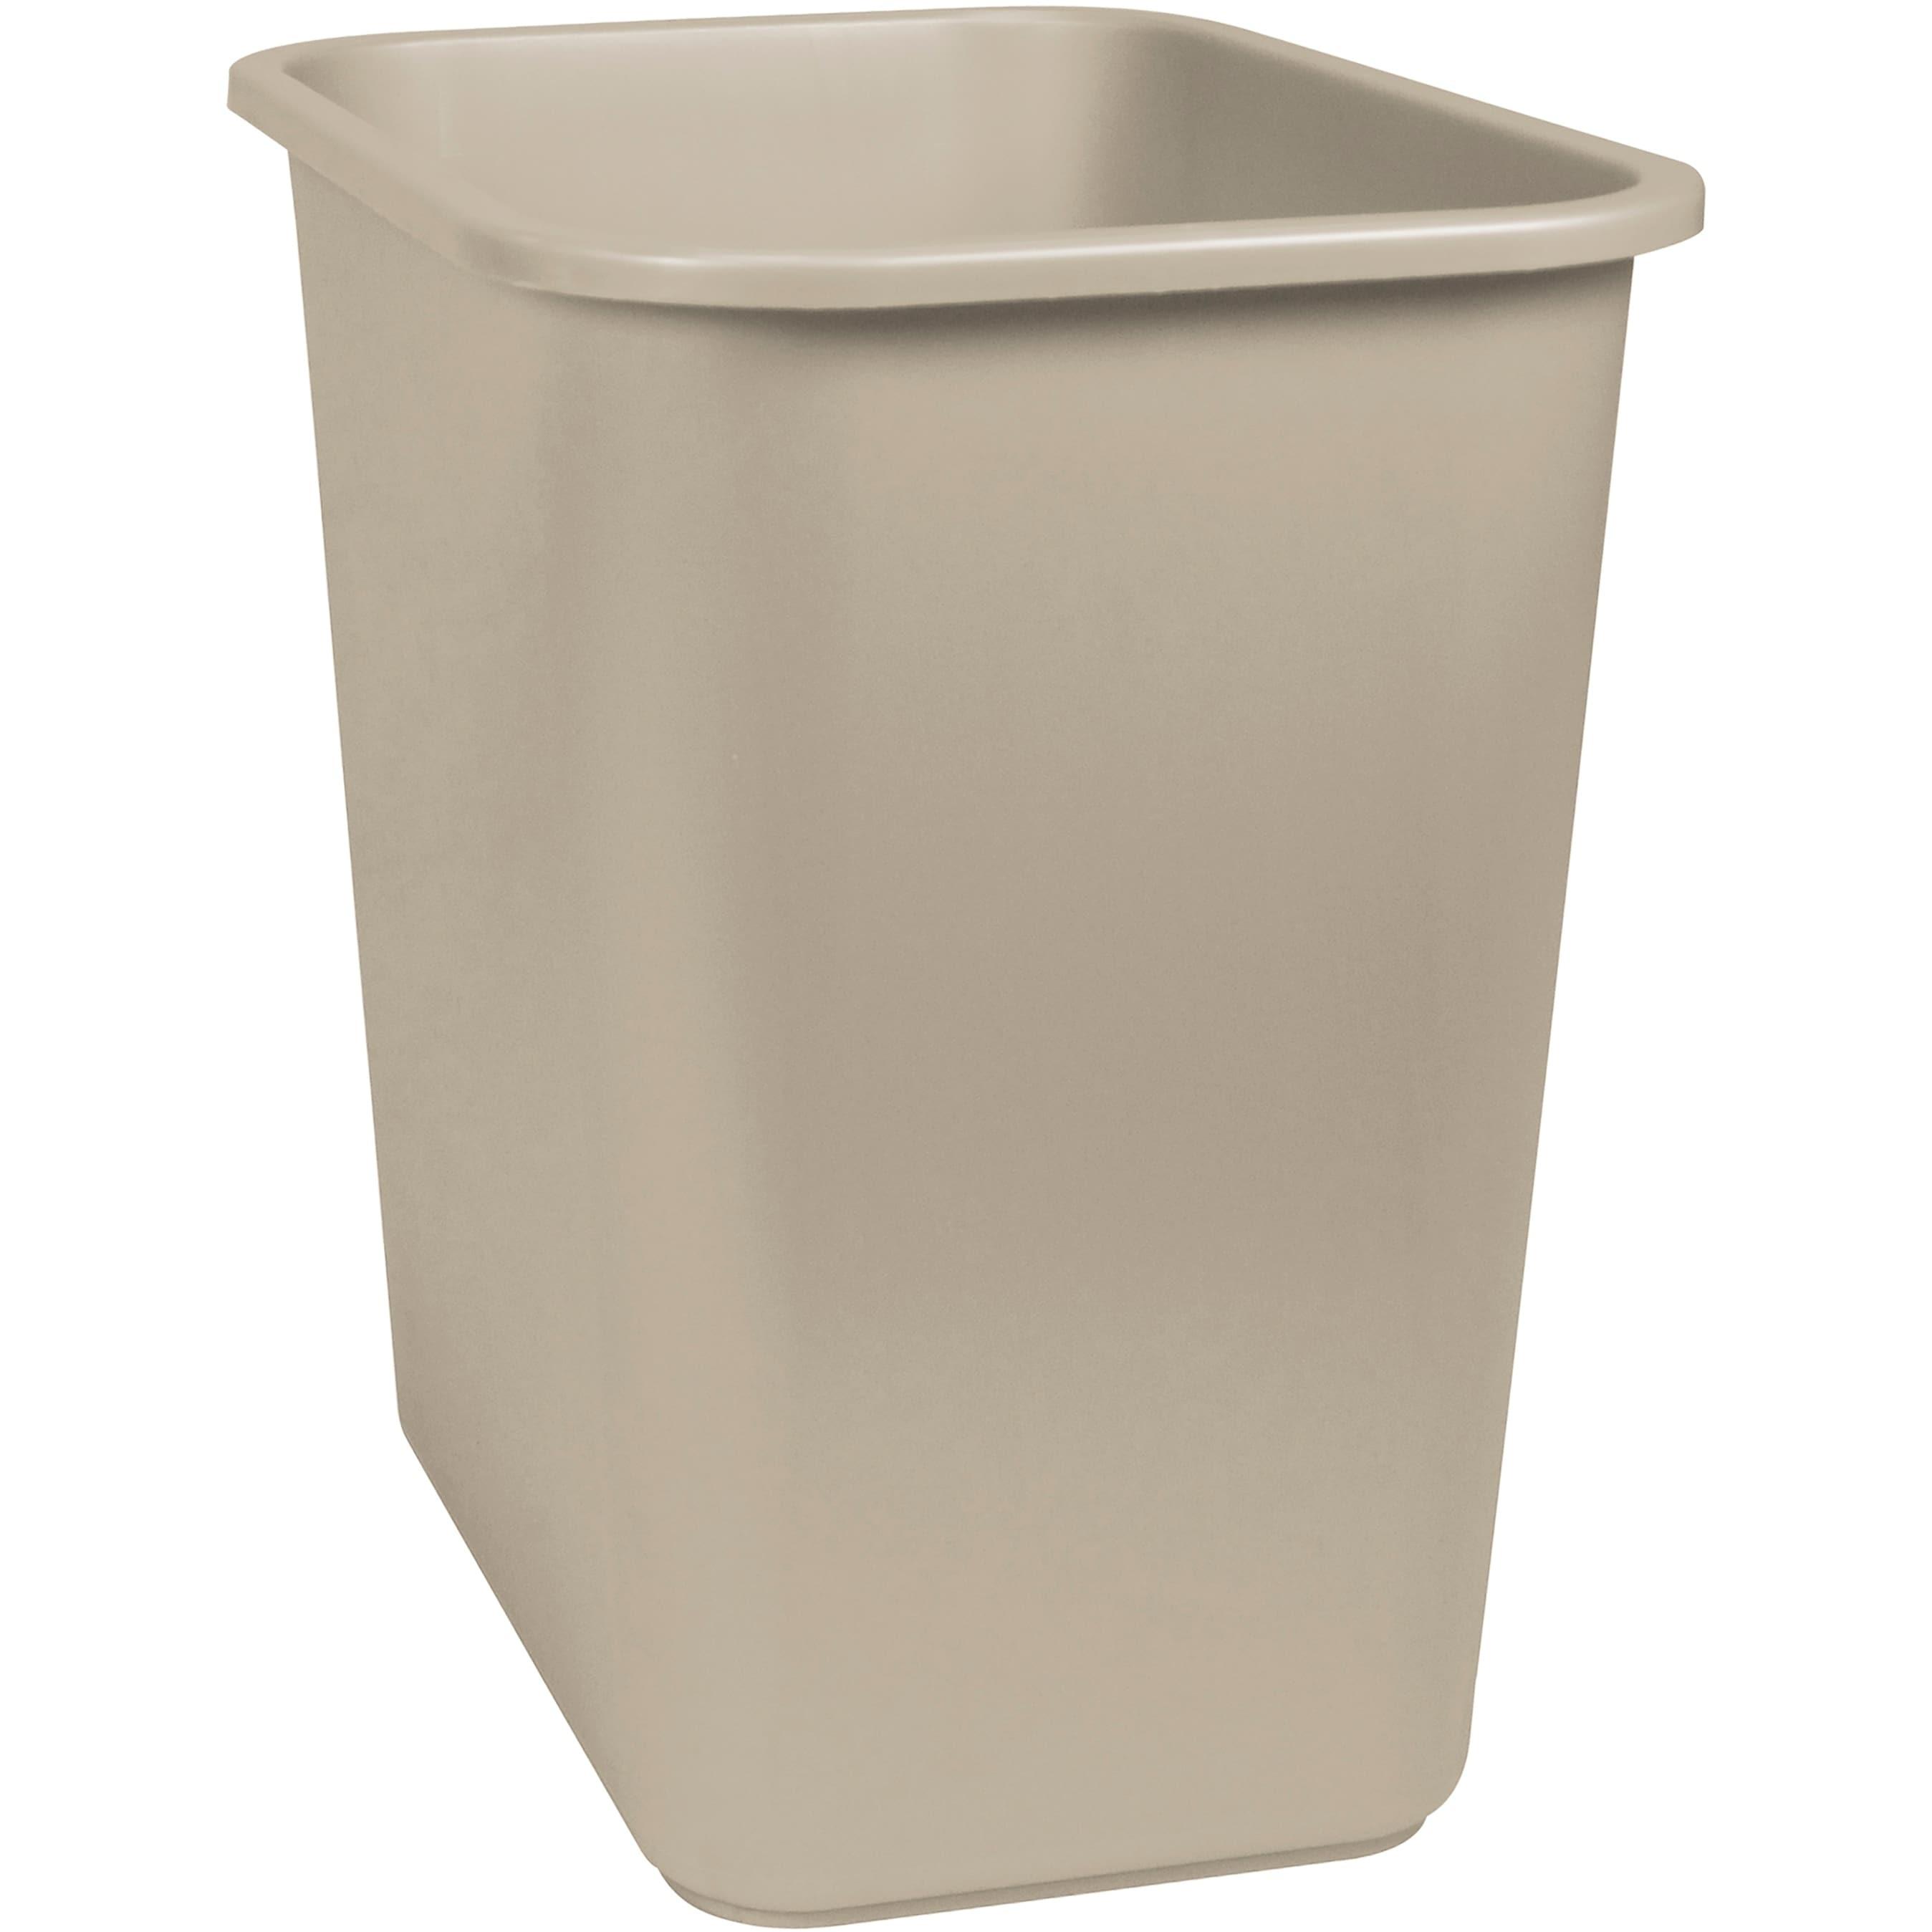 Blue 12 Units 15 x 10.5 x 15 Inches Storex Medium Recycling Basket